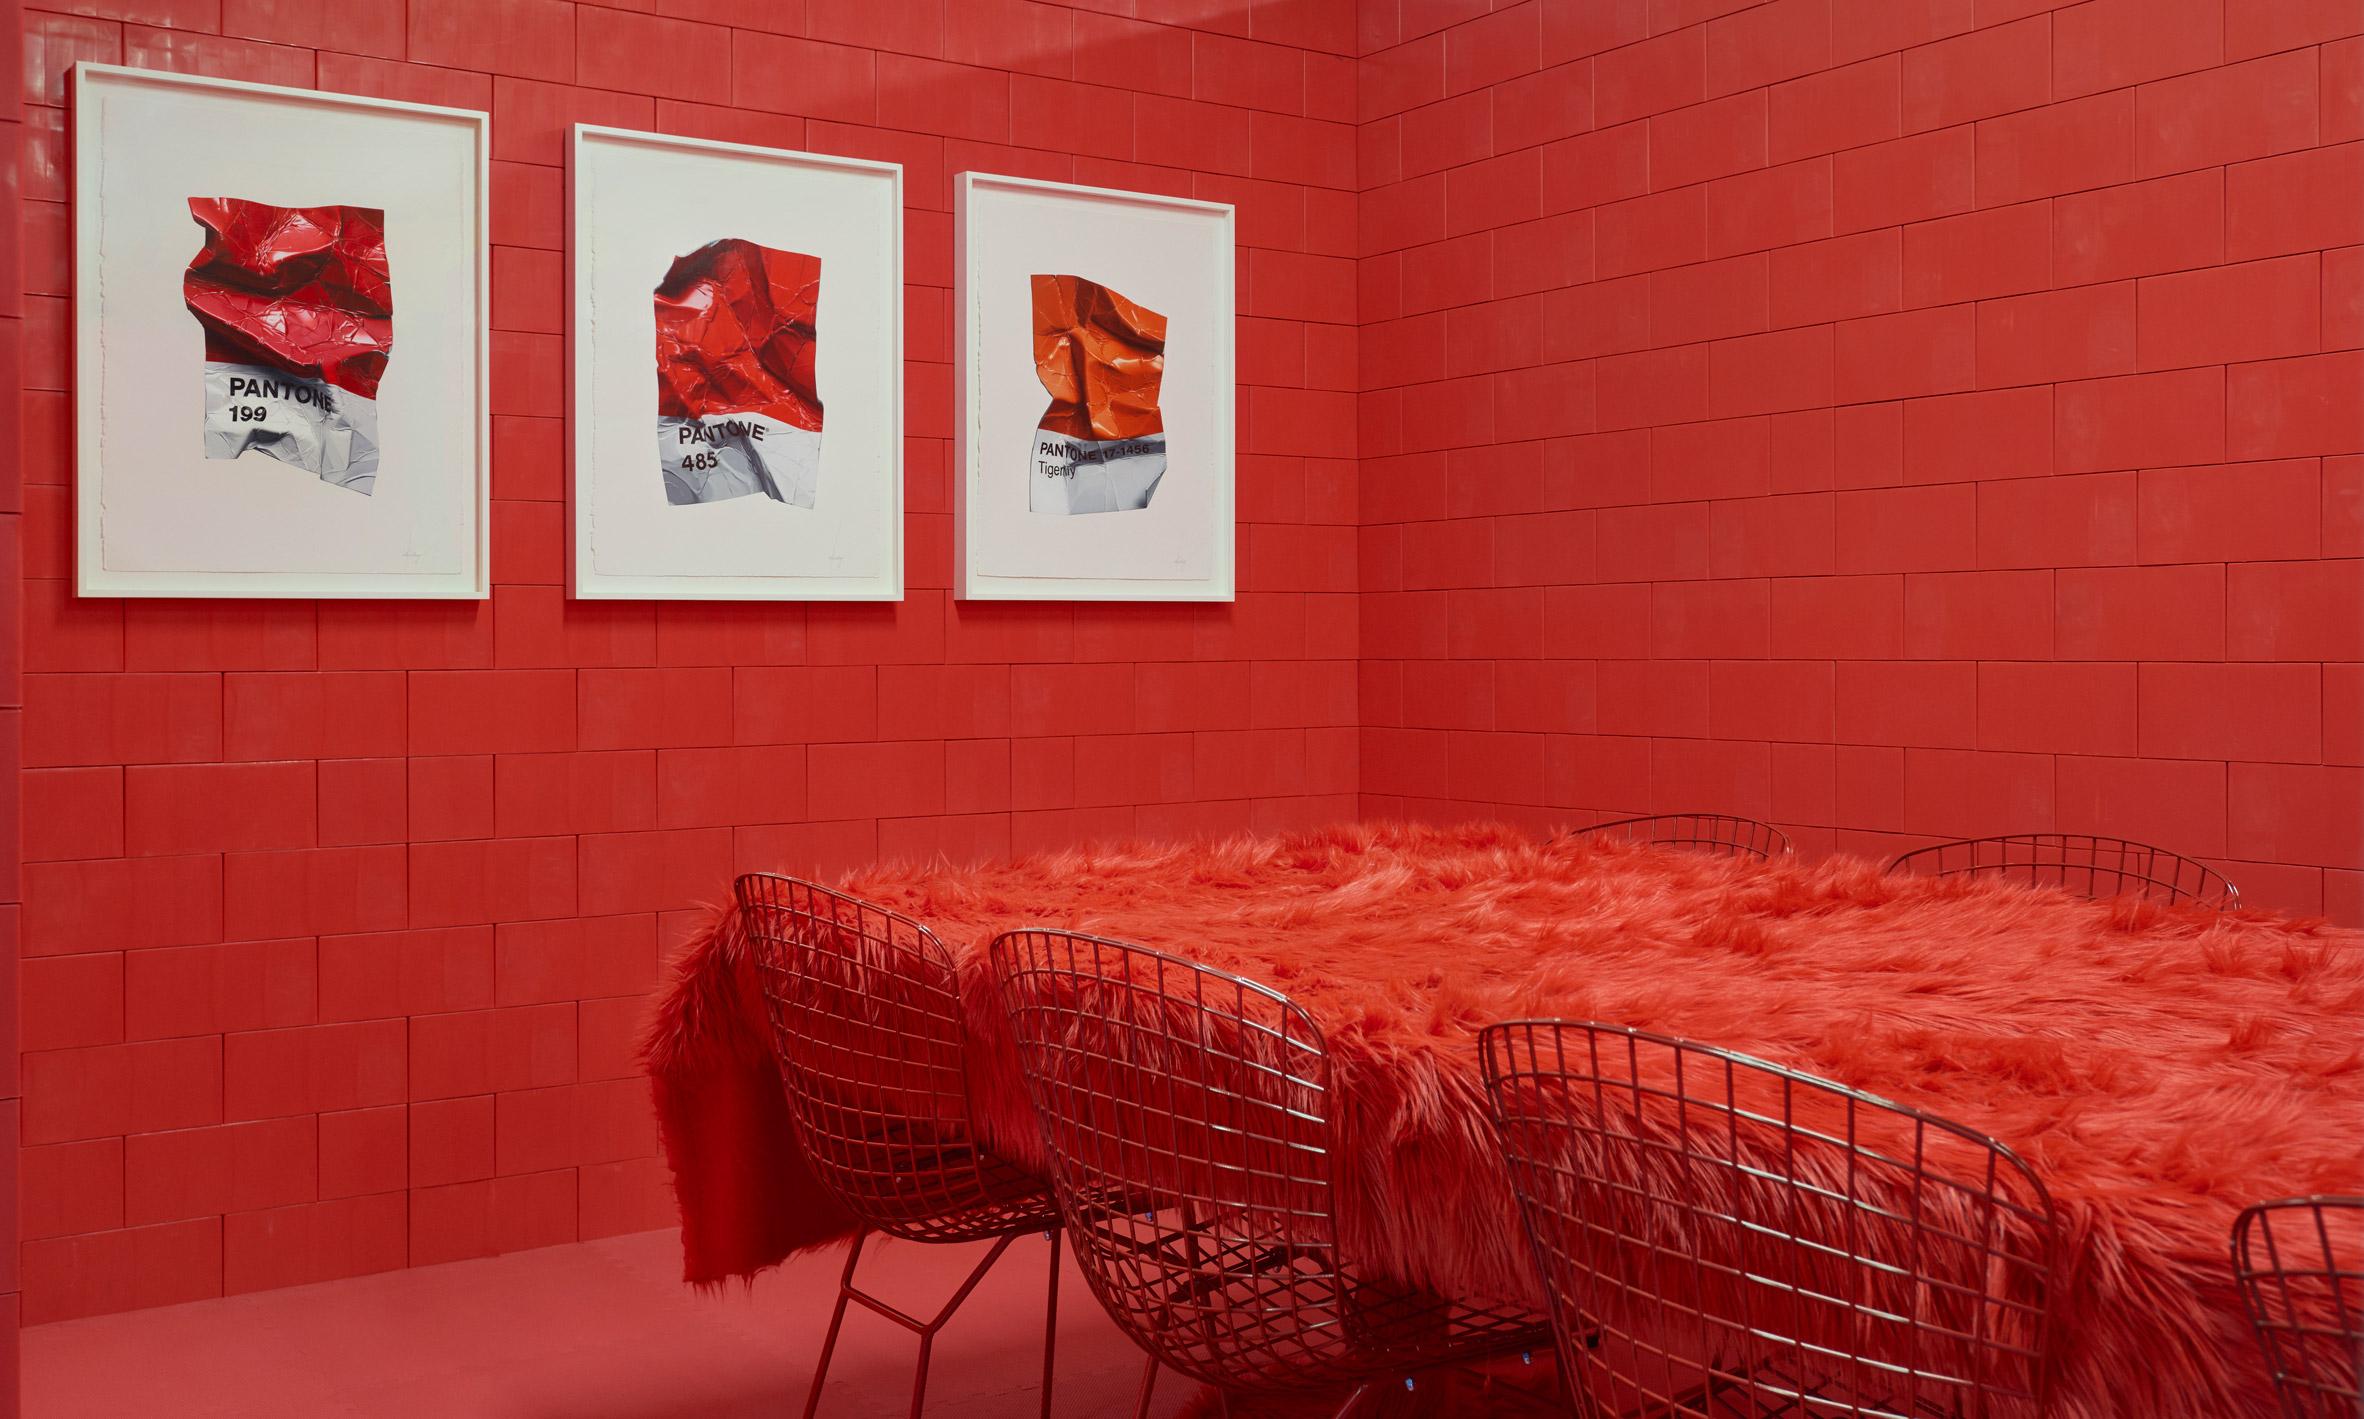 monochrome-cj-hendry-brooklyn-exhibition-colour-rooms-new-york-usa_dezeen_2364_col_18.jpg